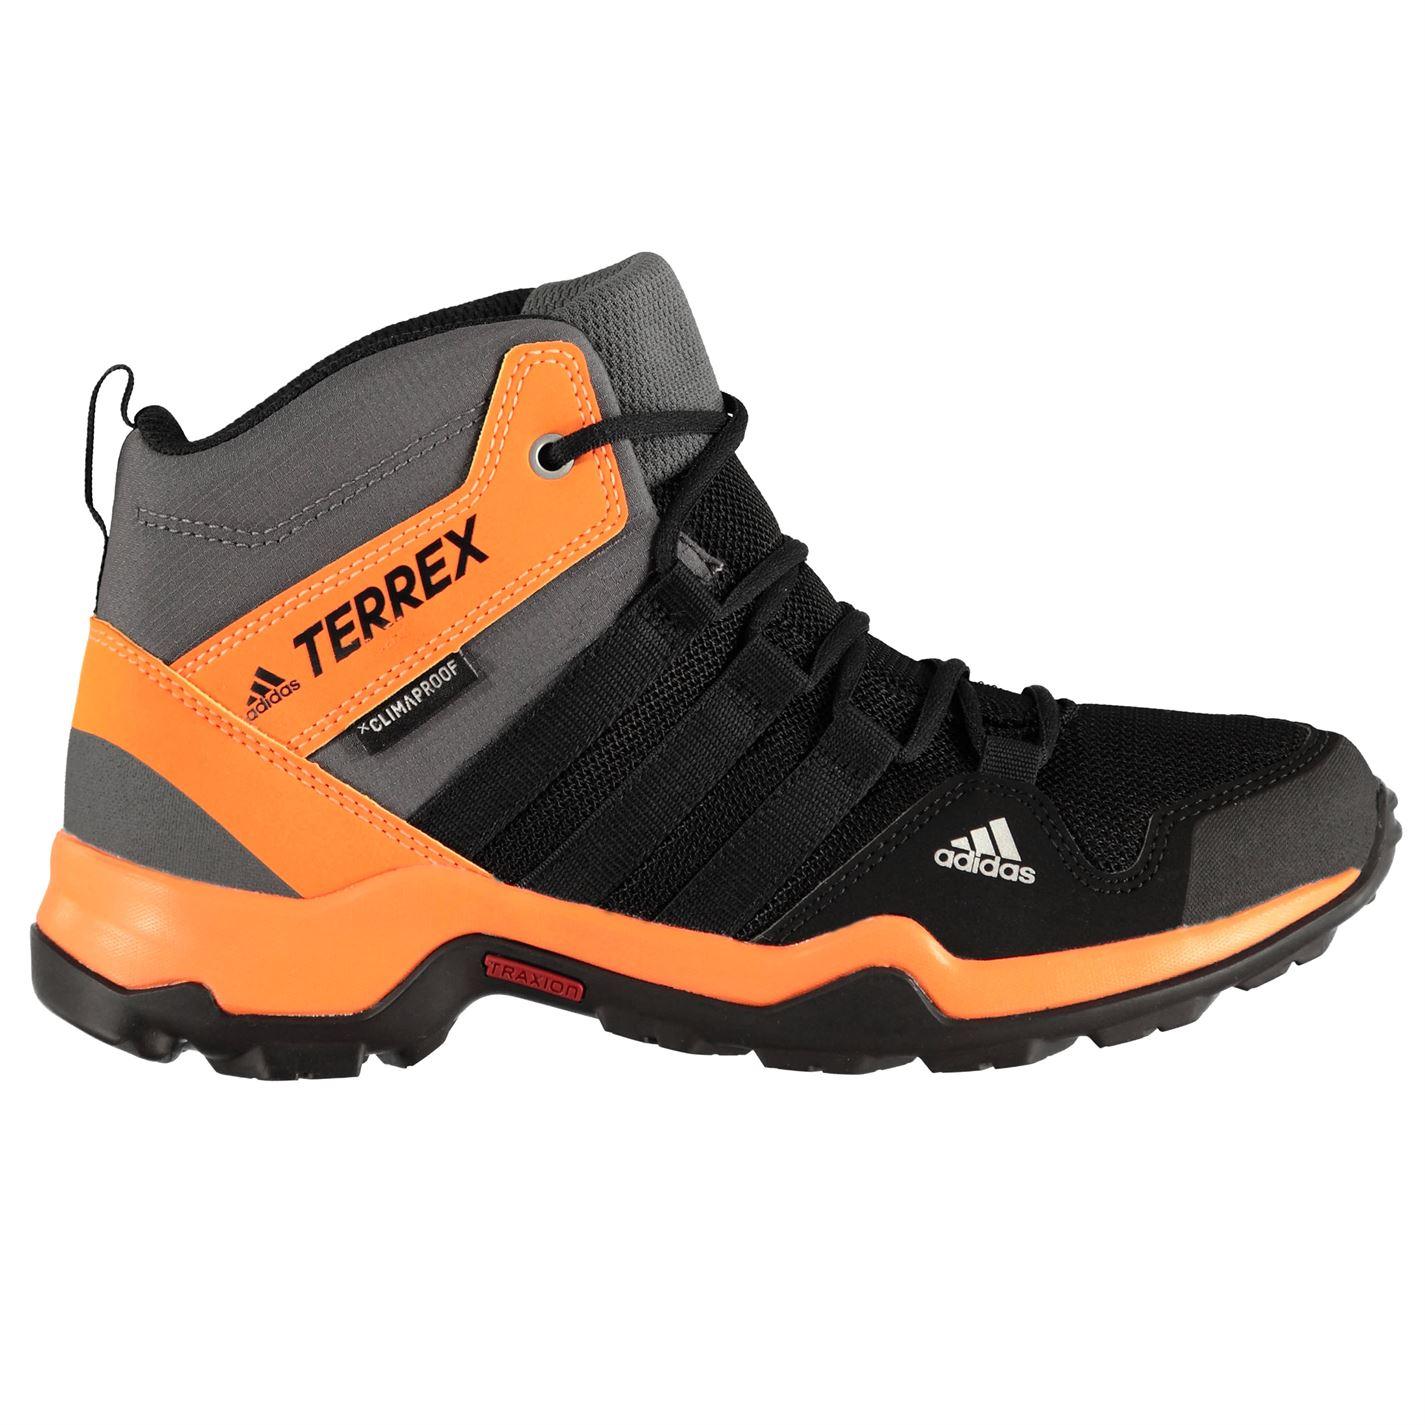 8aab59b7cc961 ... TERREX AX2R Mid Dětská outdoorová obuv. -10%. adidas ...